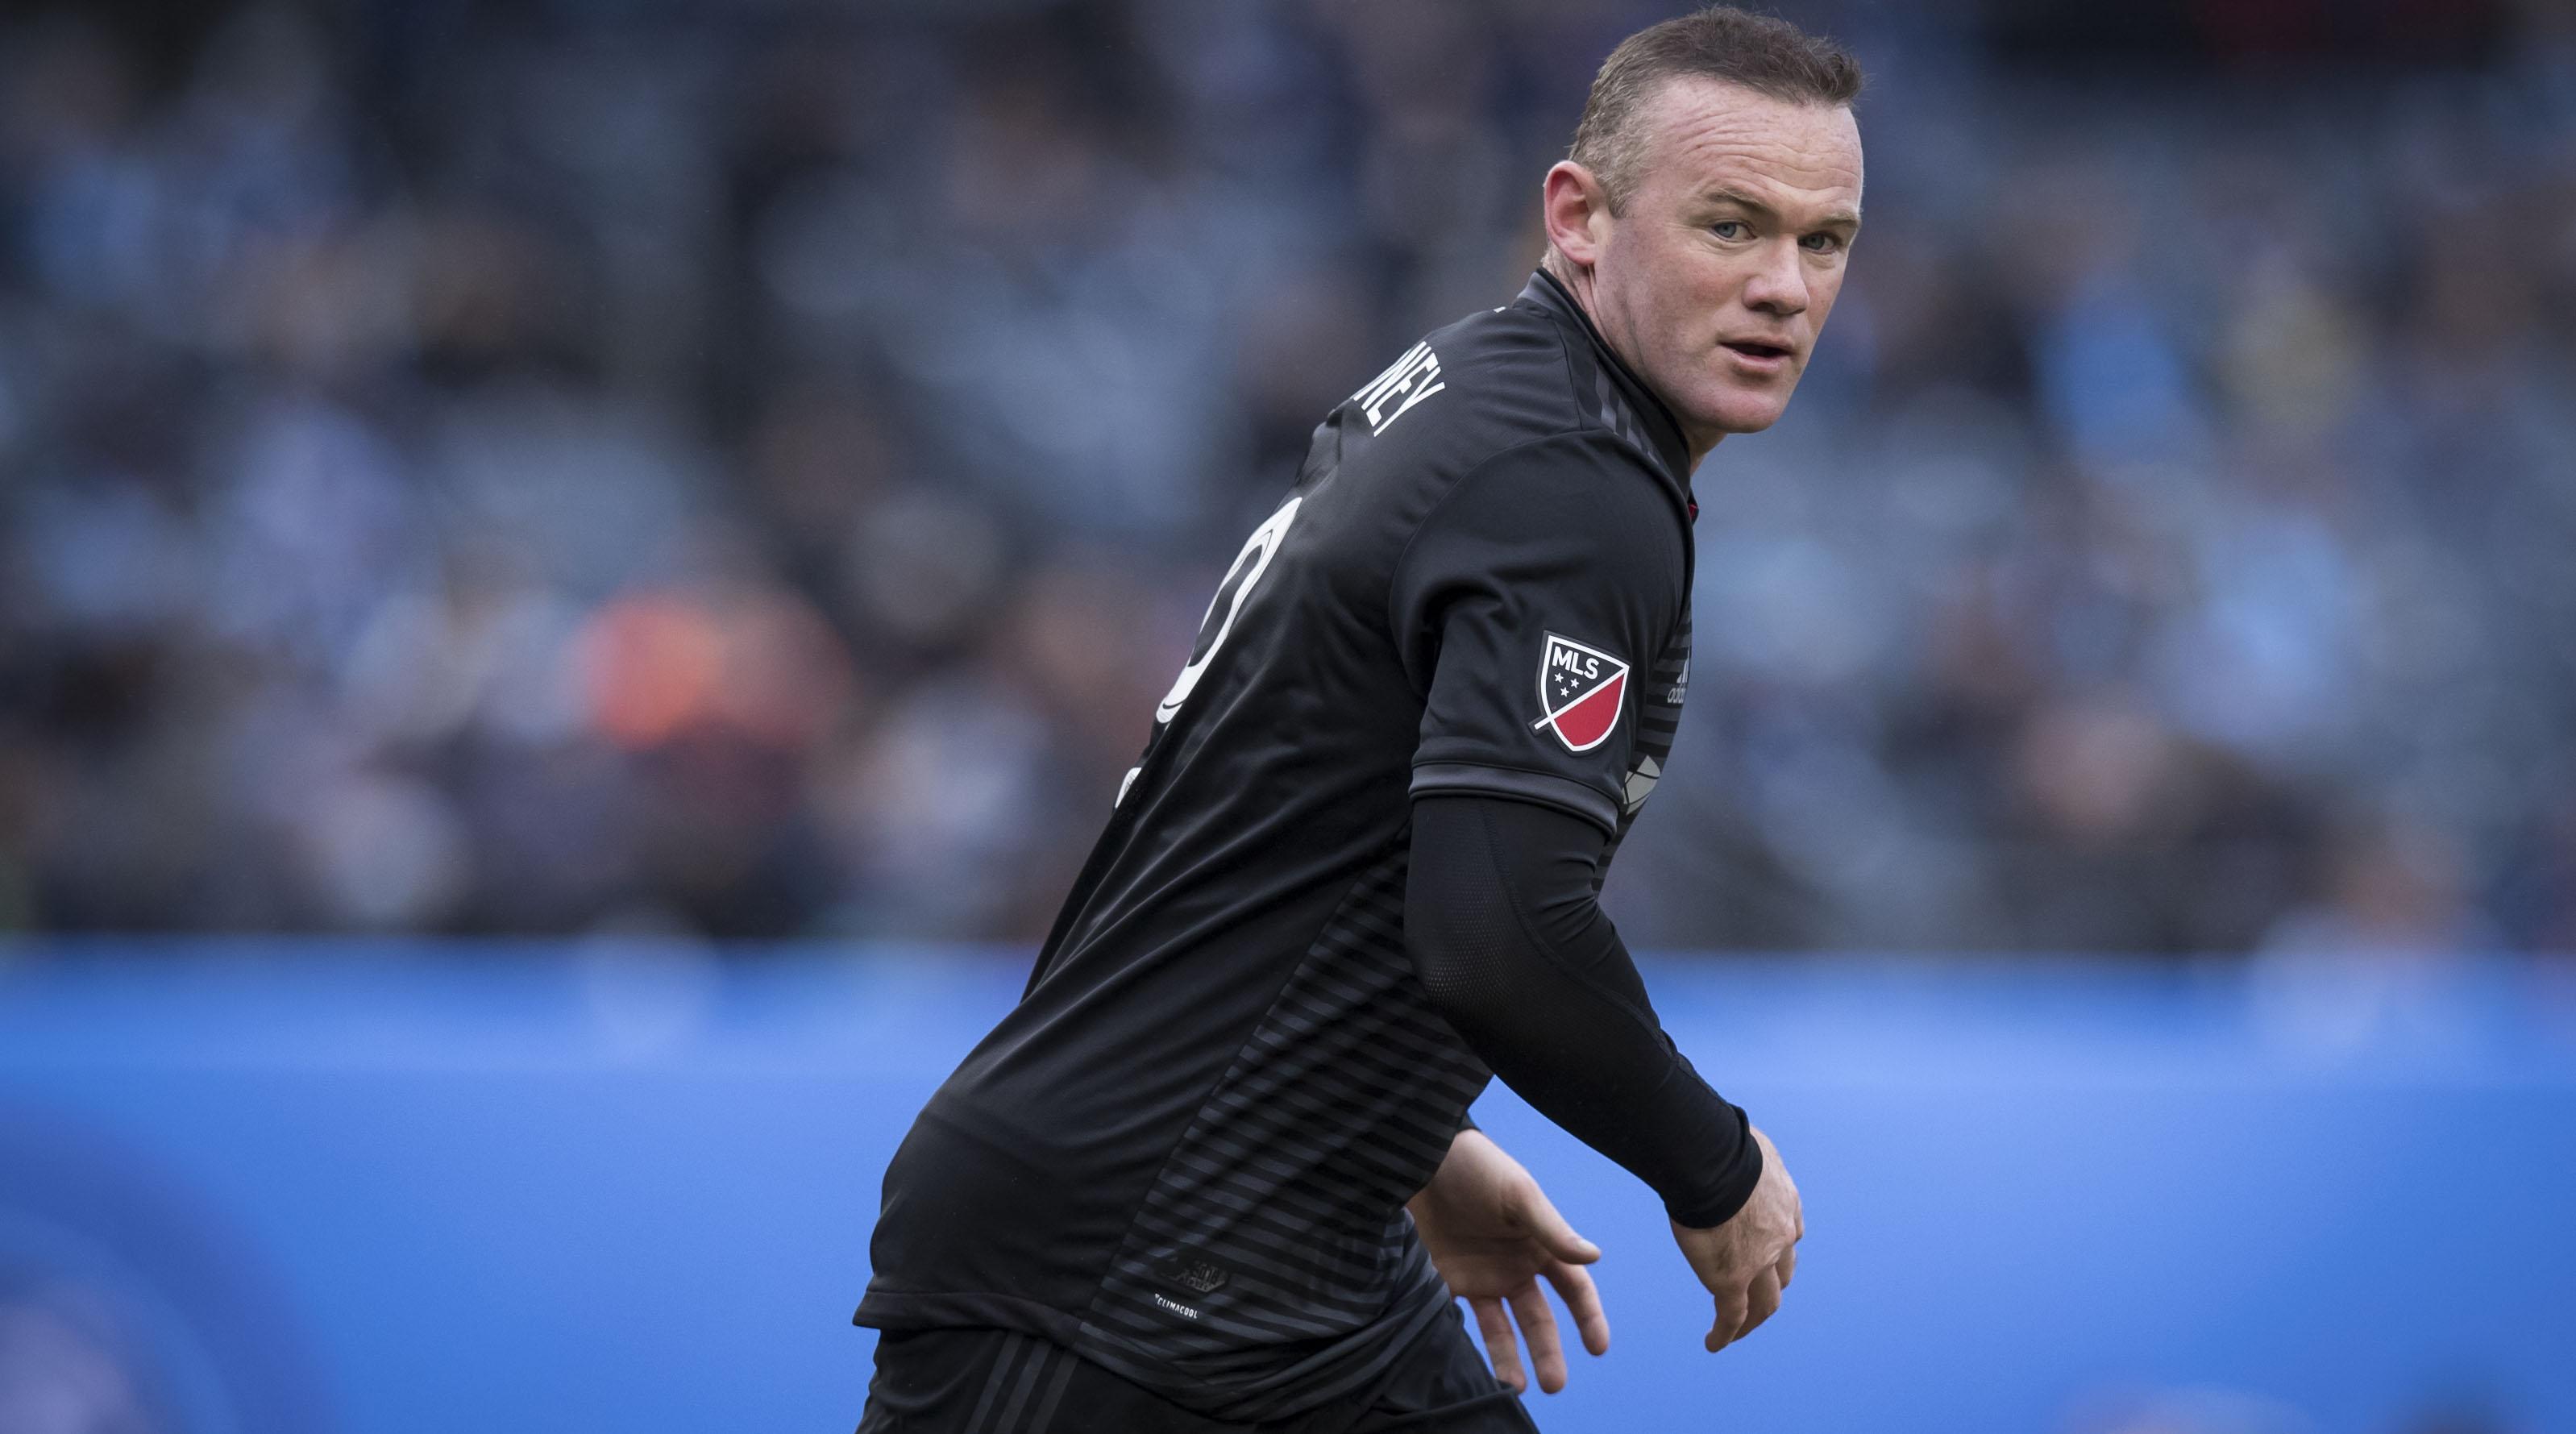 Wayne Rooney scores ridiculous free kick